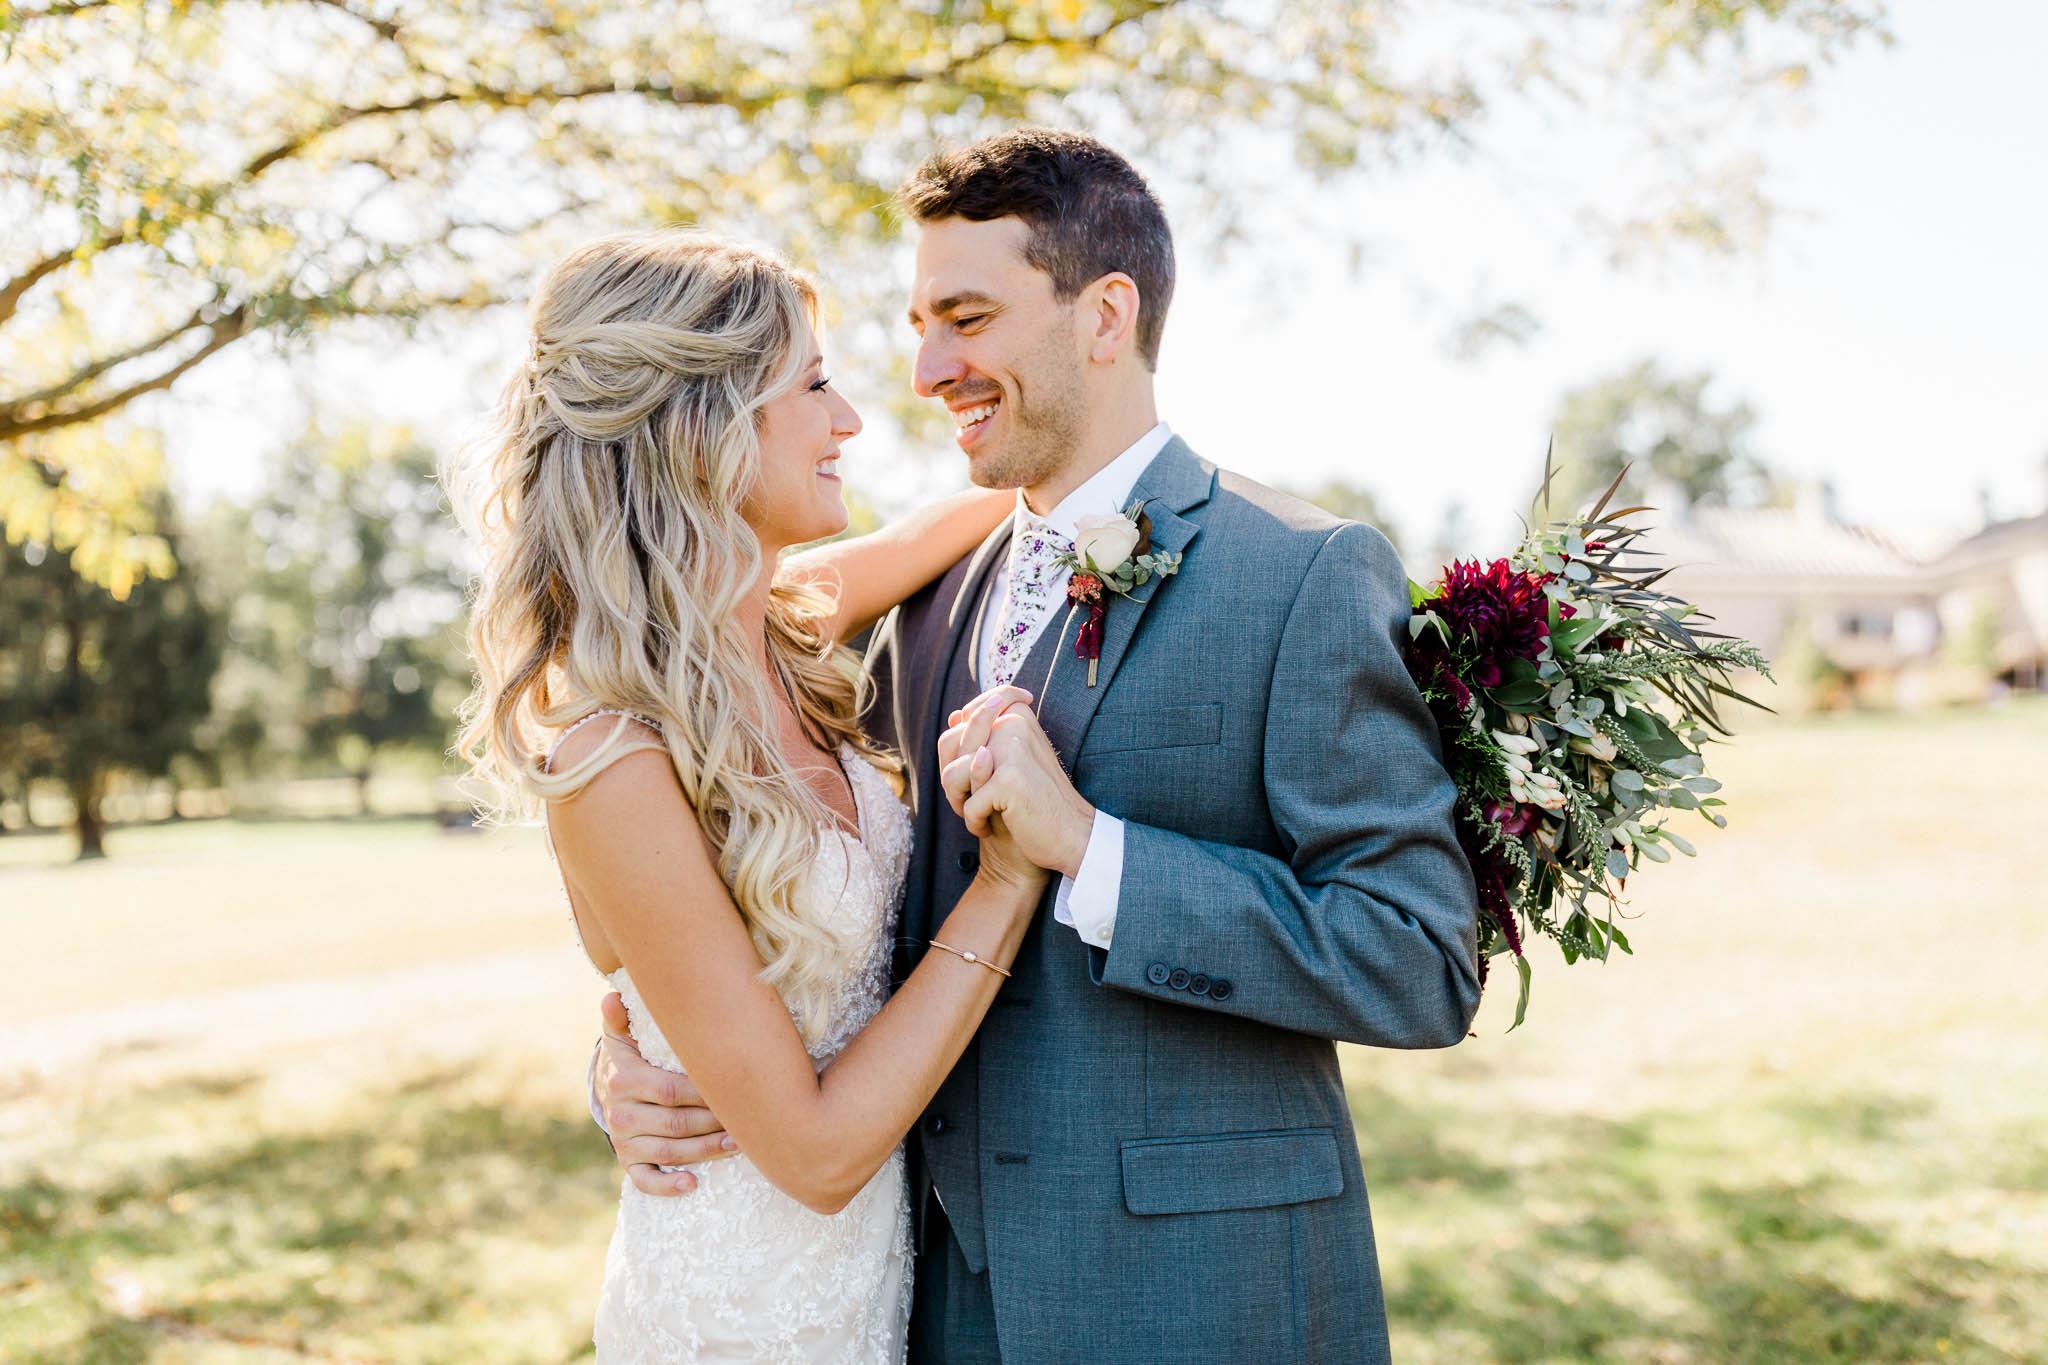 Frosty-Valley-September-Wedding-7614.jpg